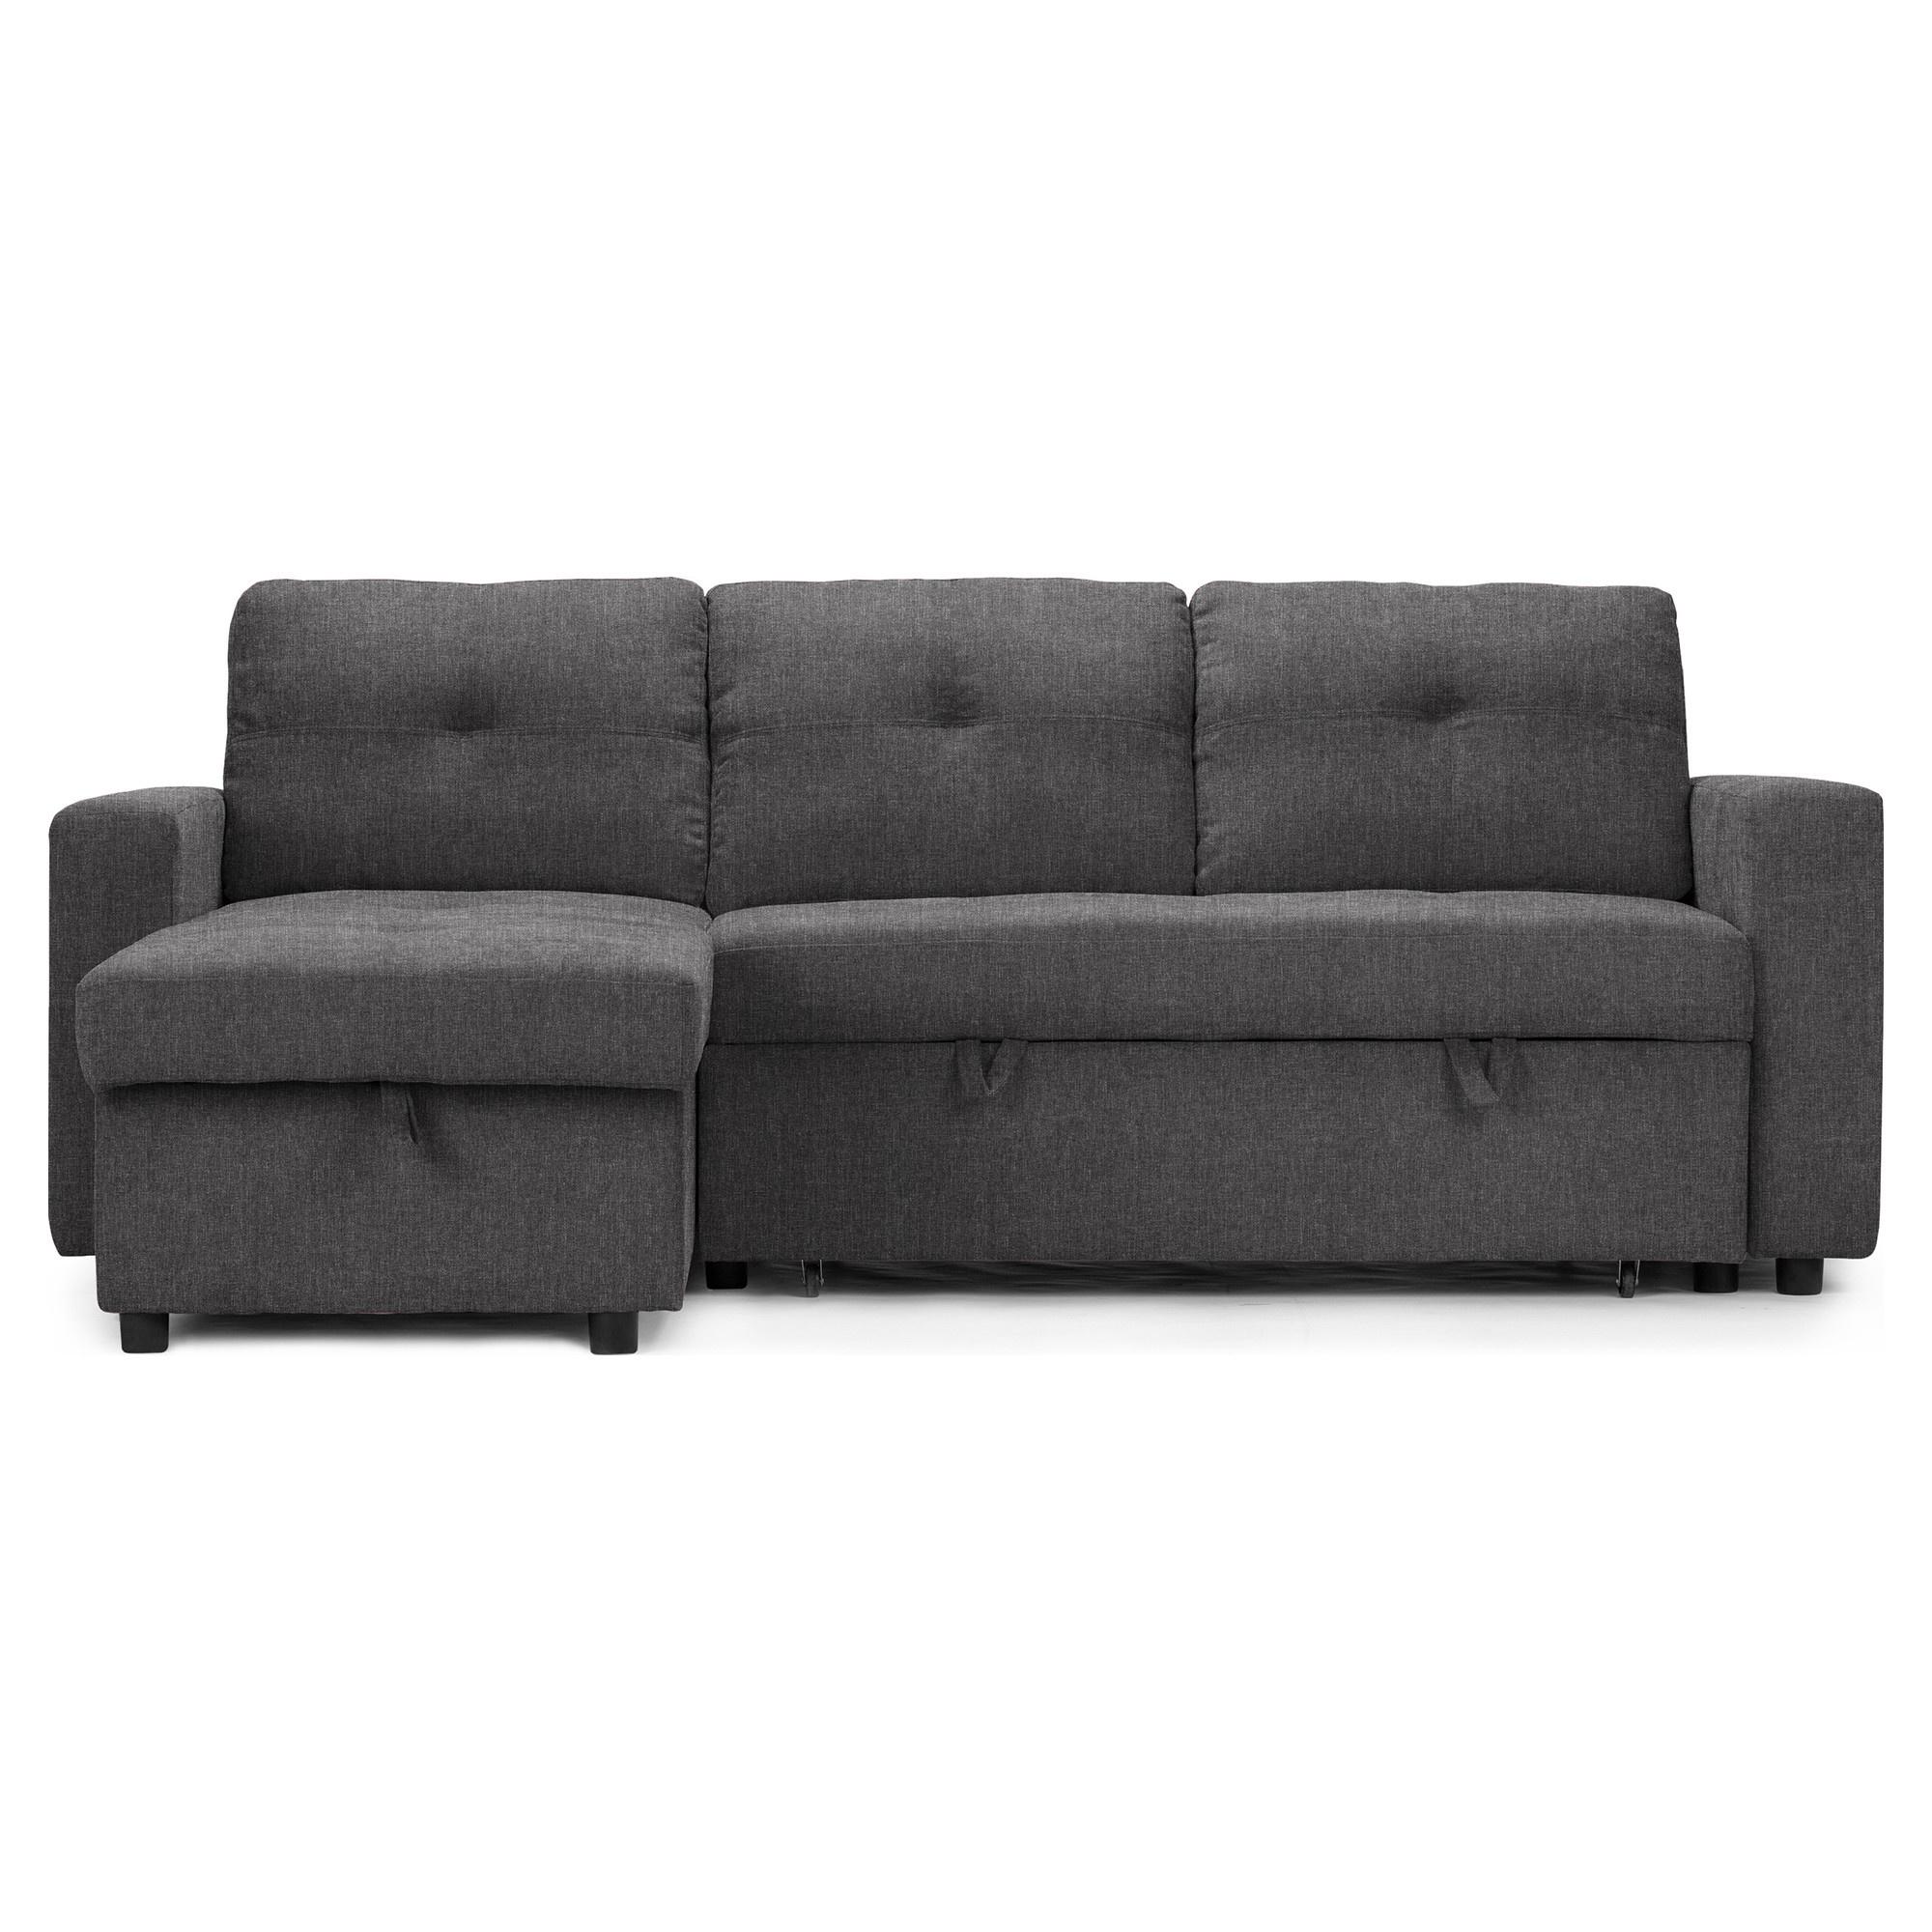 Grey Sectional Sofa Futon Maison Caplan